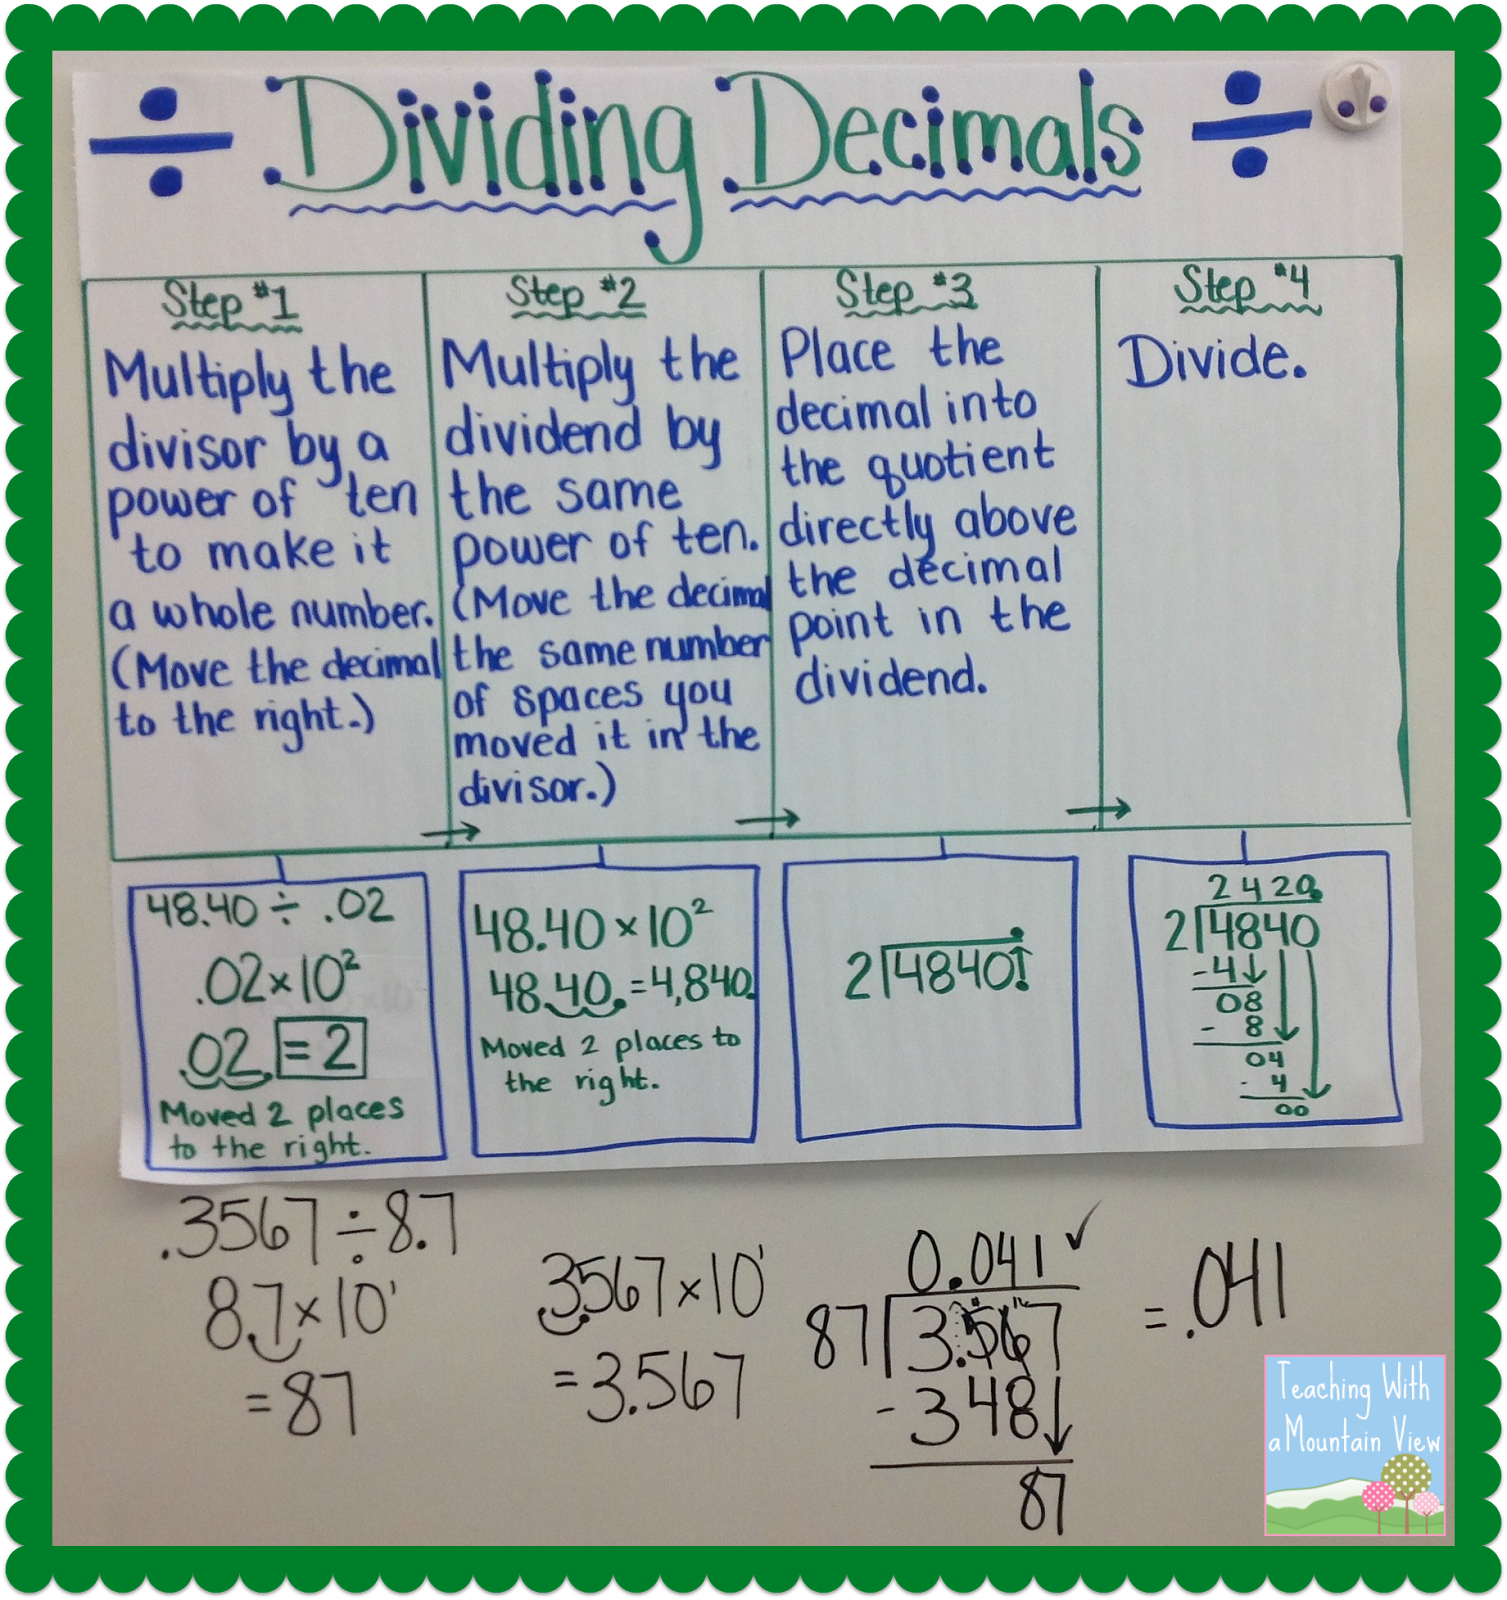 Dividing Decimals: Steps, Rules & Examples - Video & Lesson ...